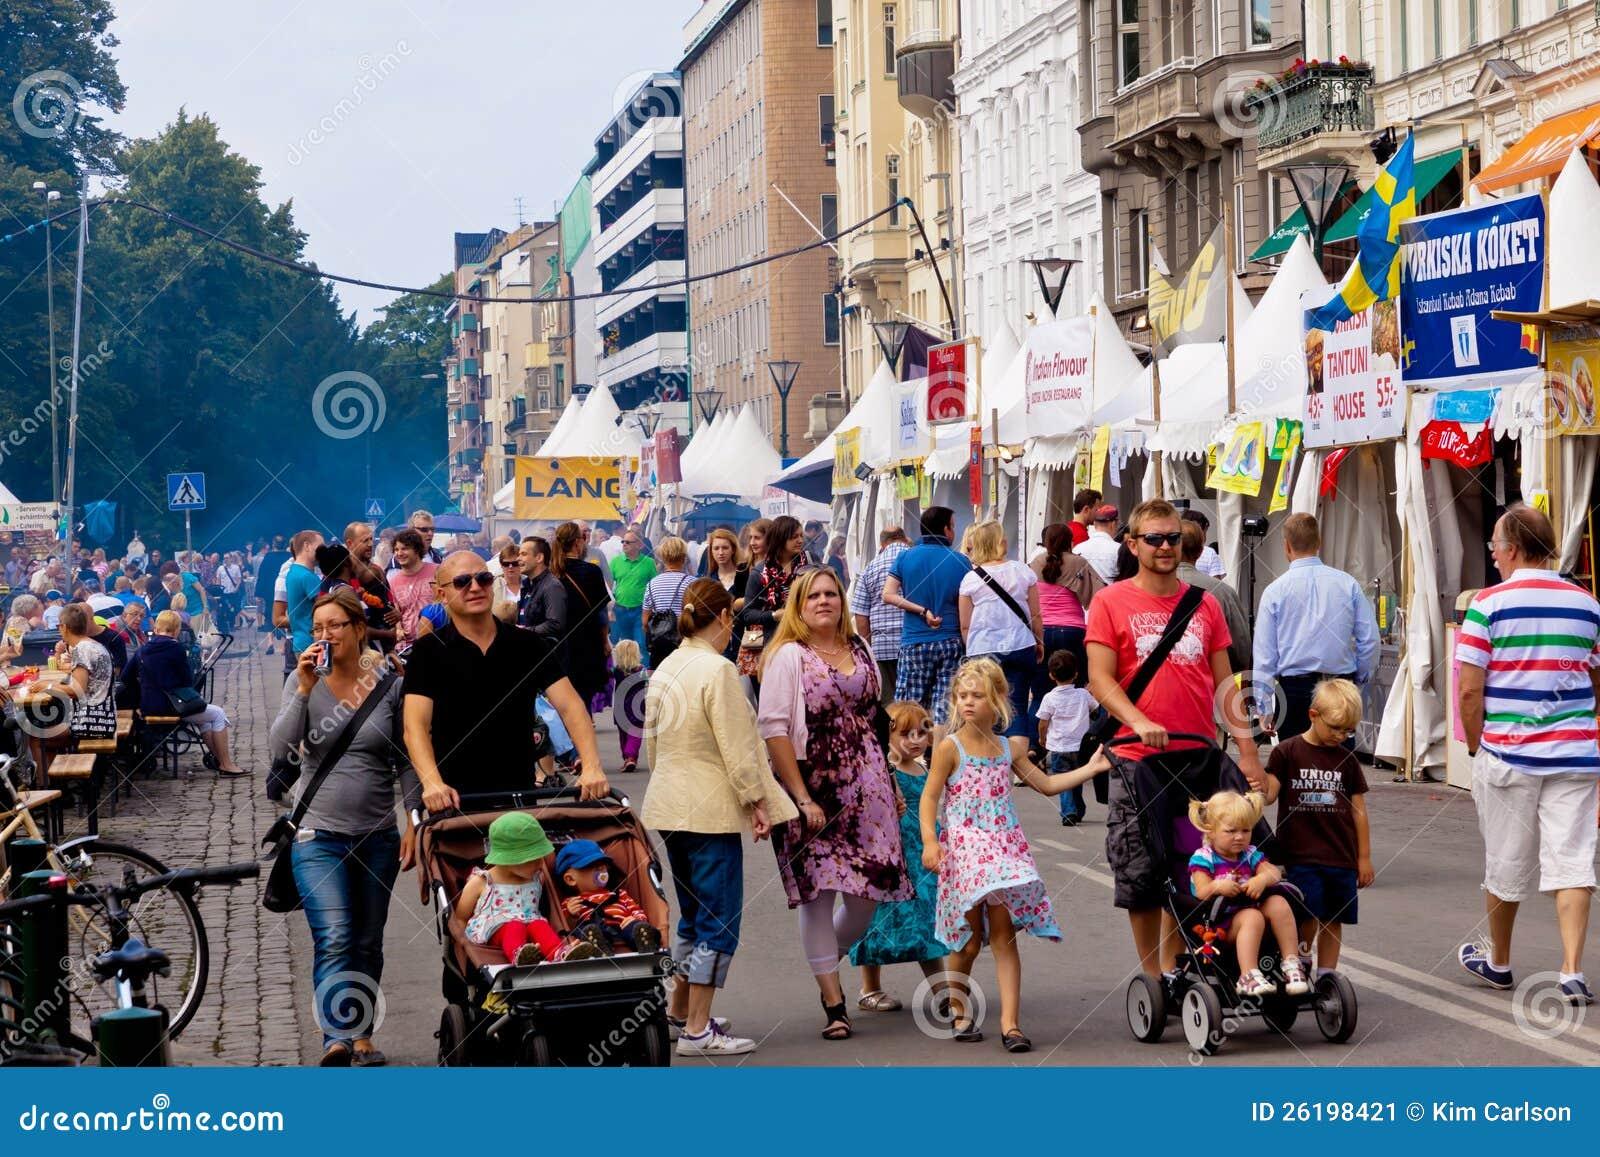 Malmo Food Festival